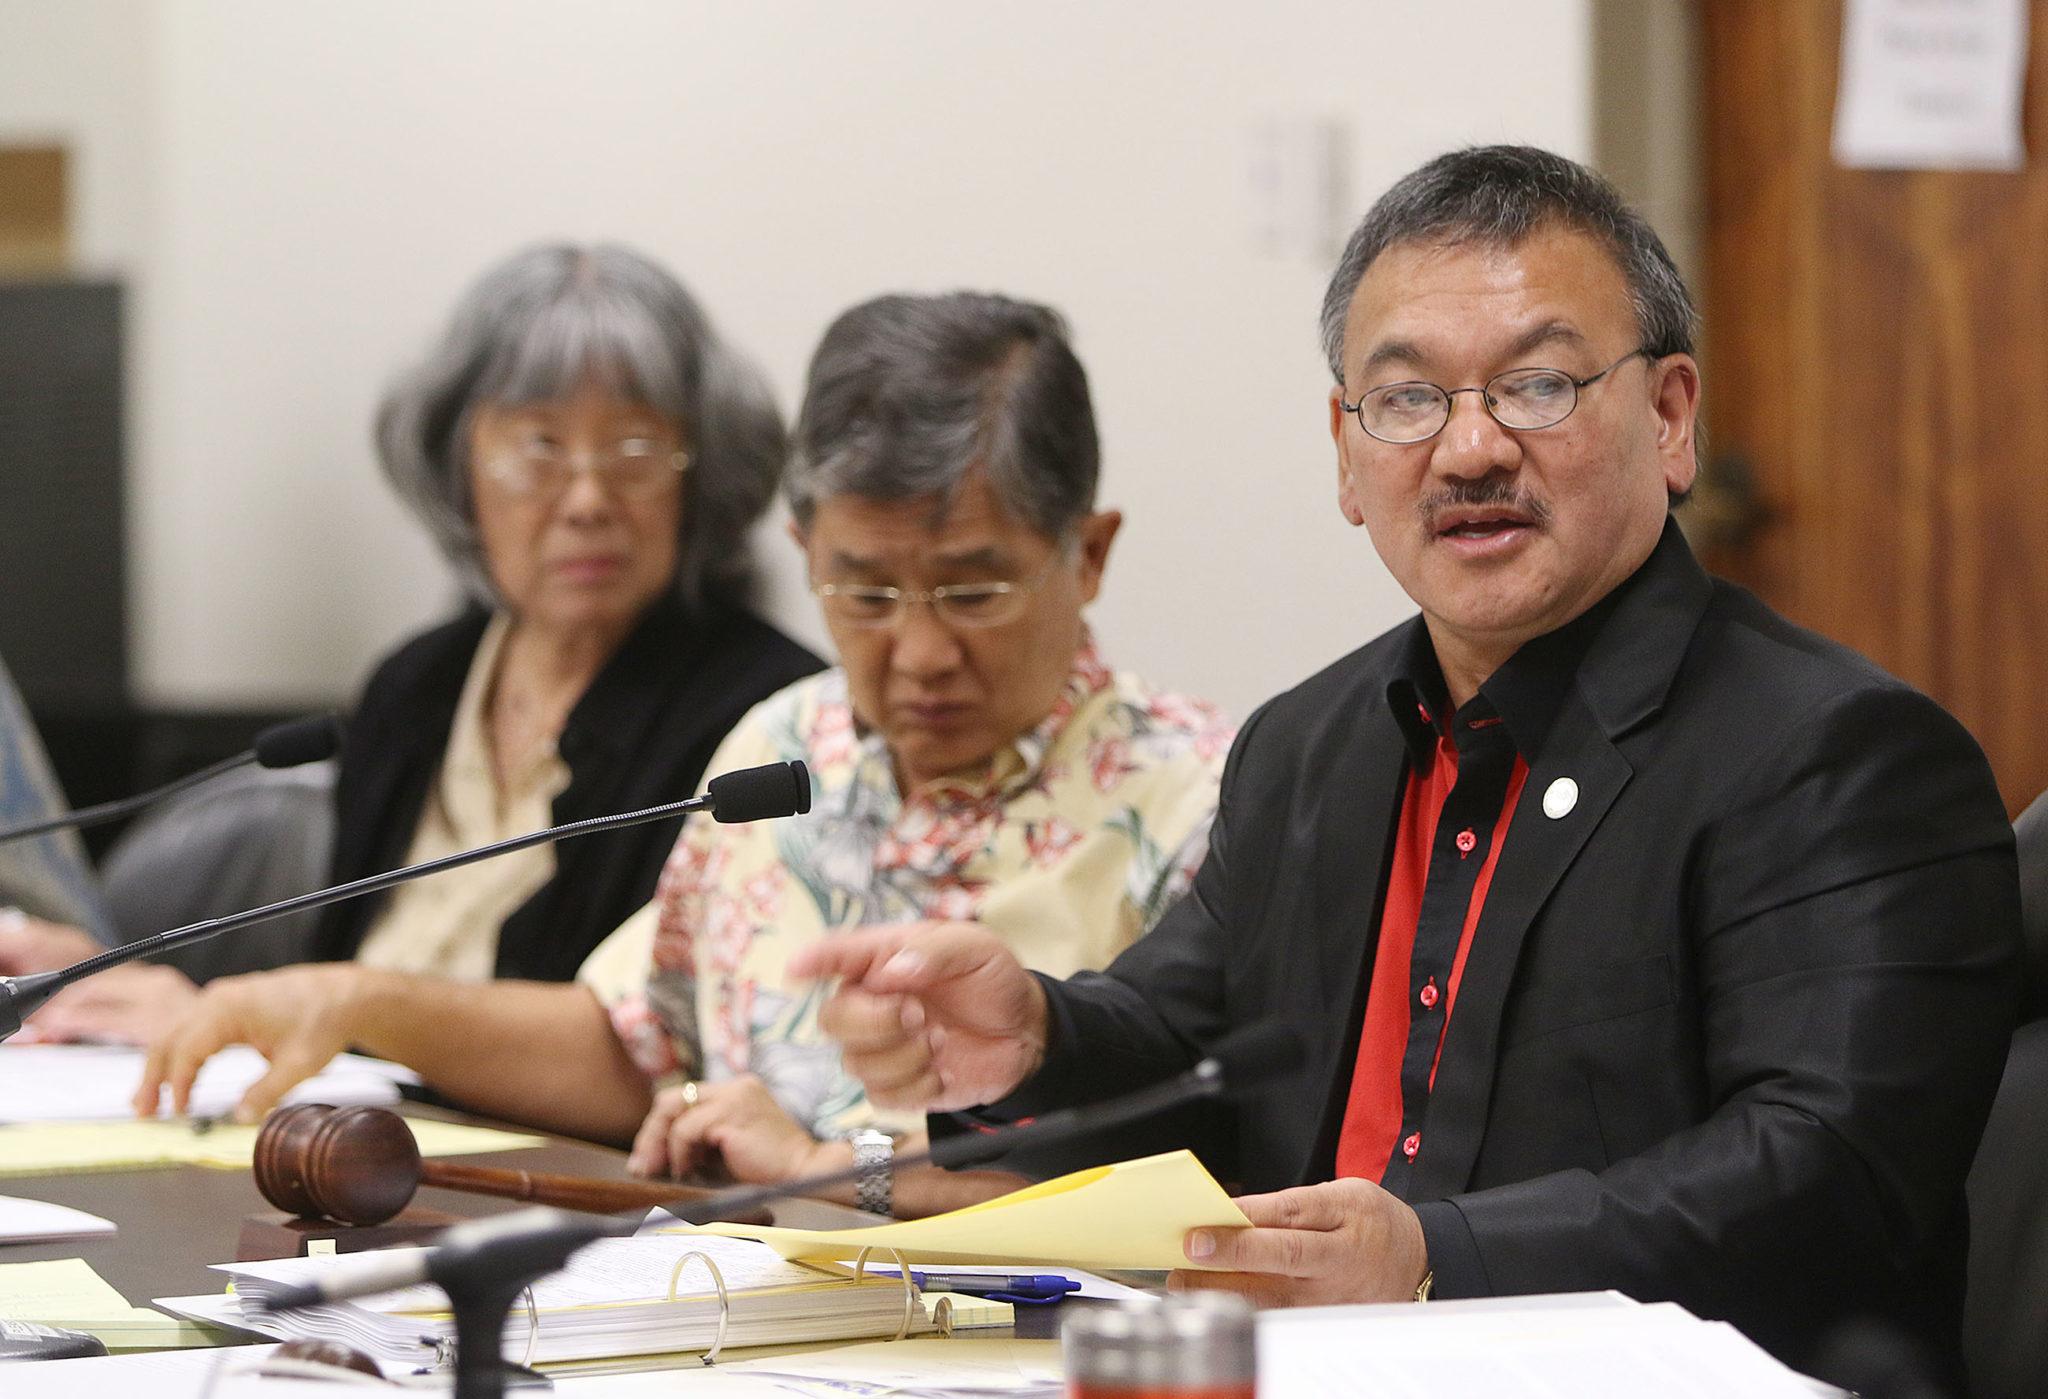 Chair Rep John Mizuno during hearing at the Capitol.